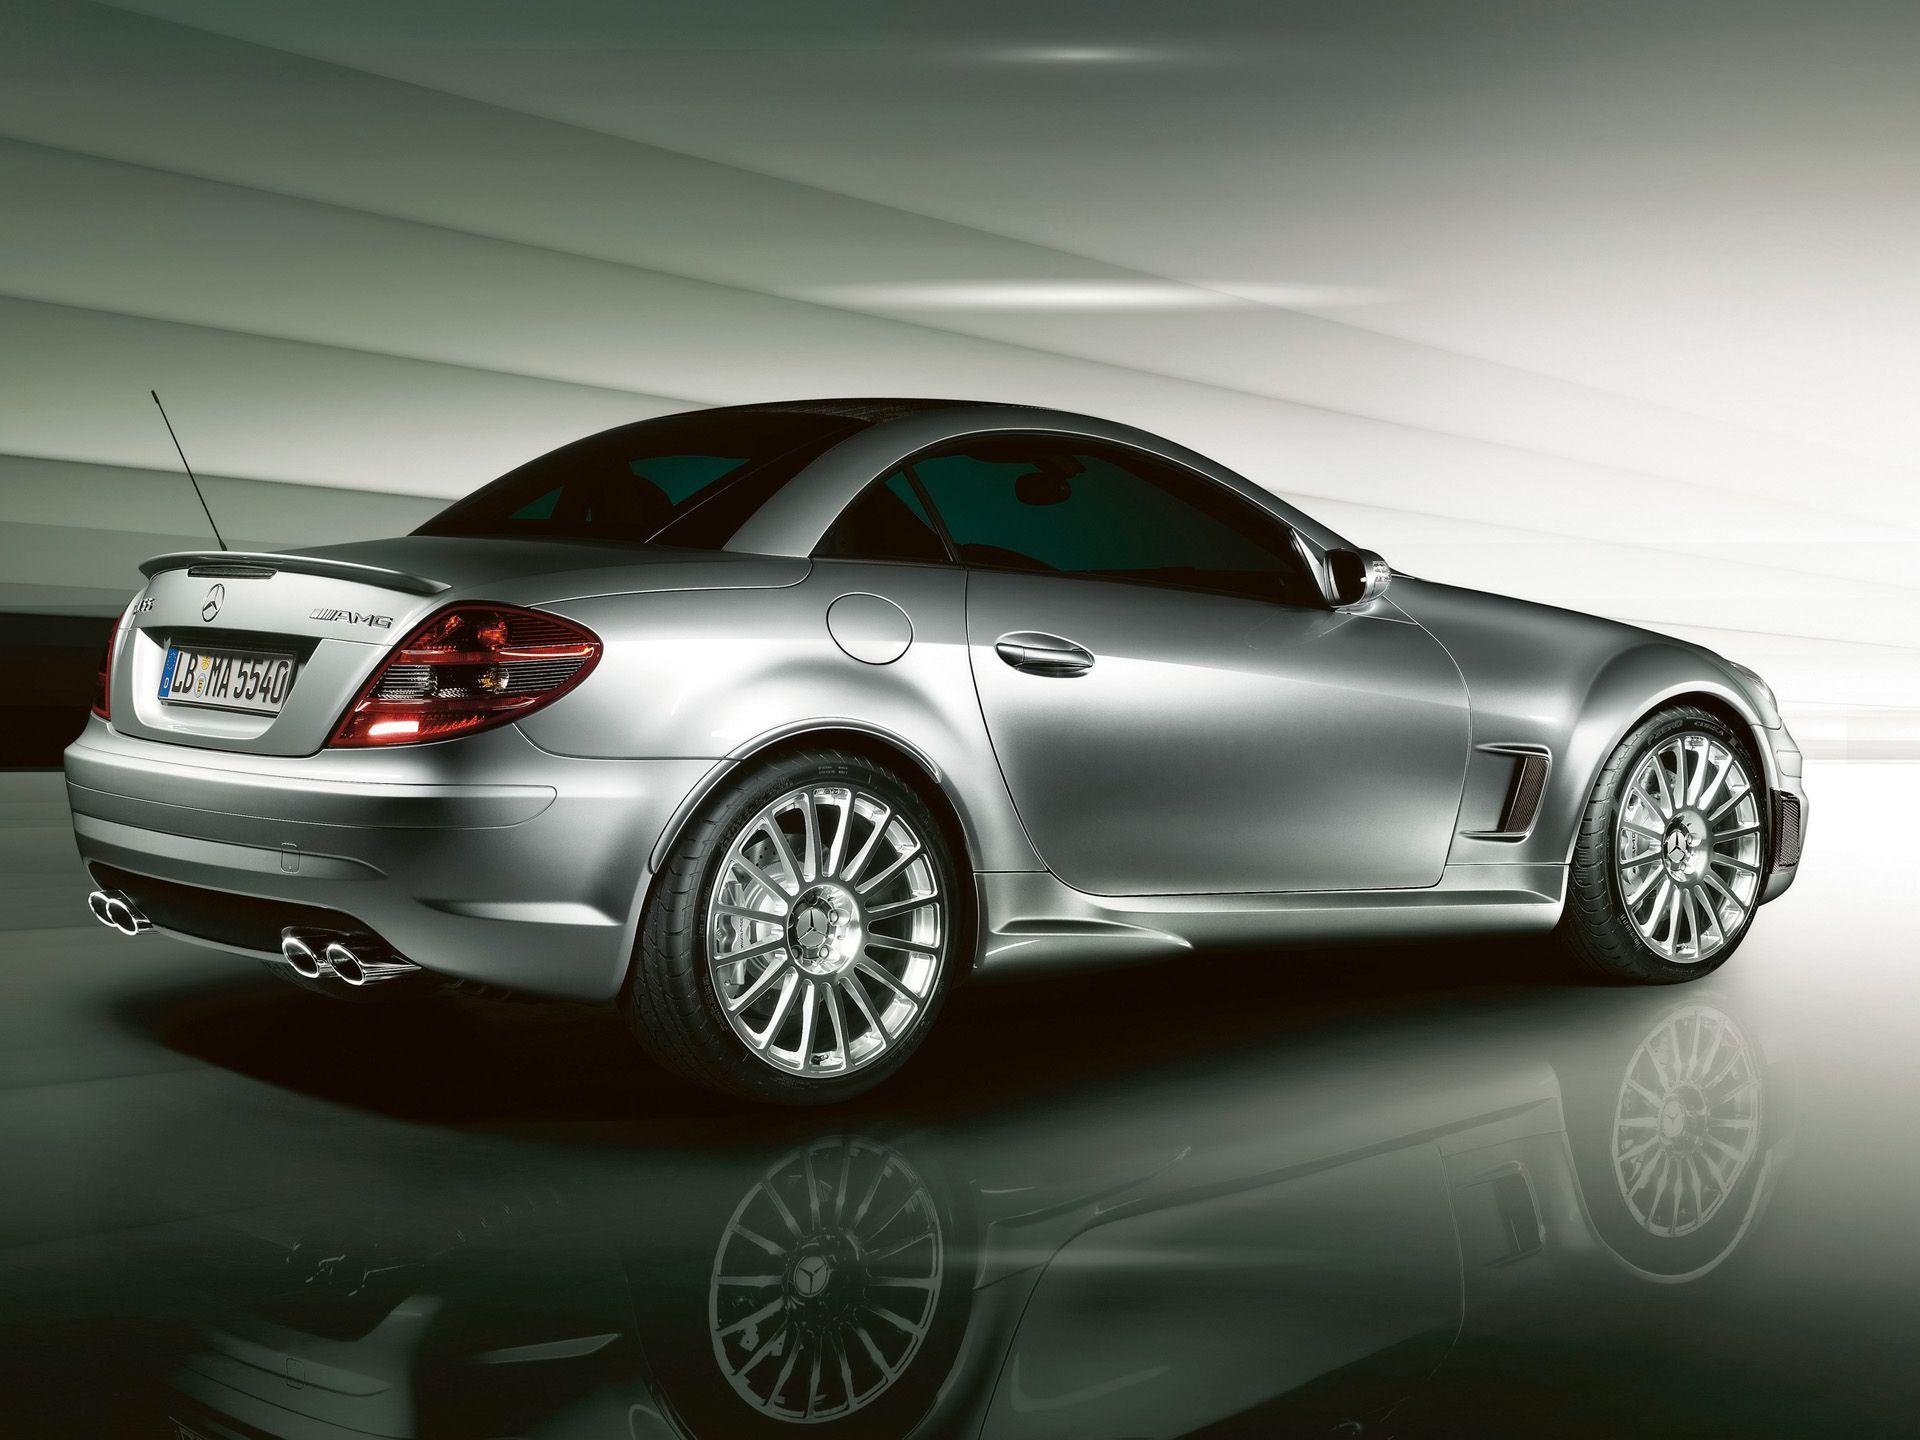 Www Illiconego Com Amg Slk55 With Images Mercedes Benz Slk